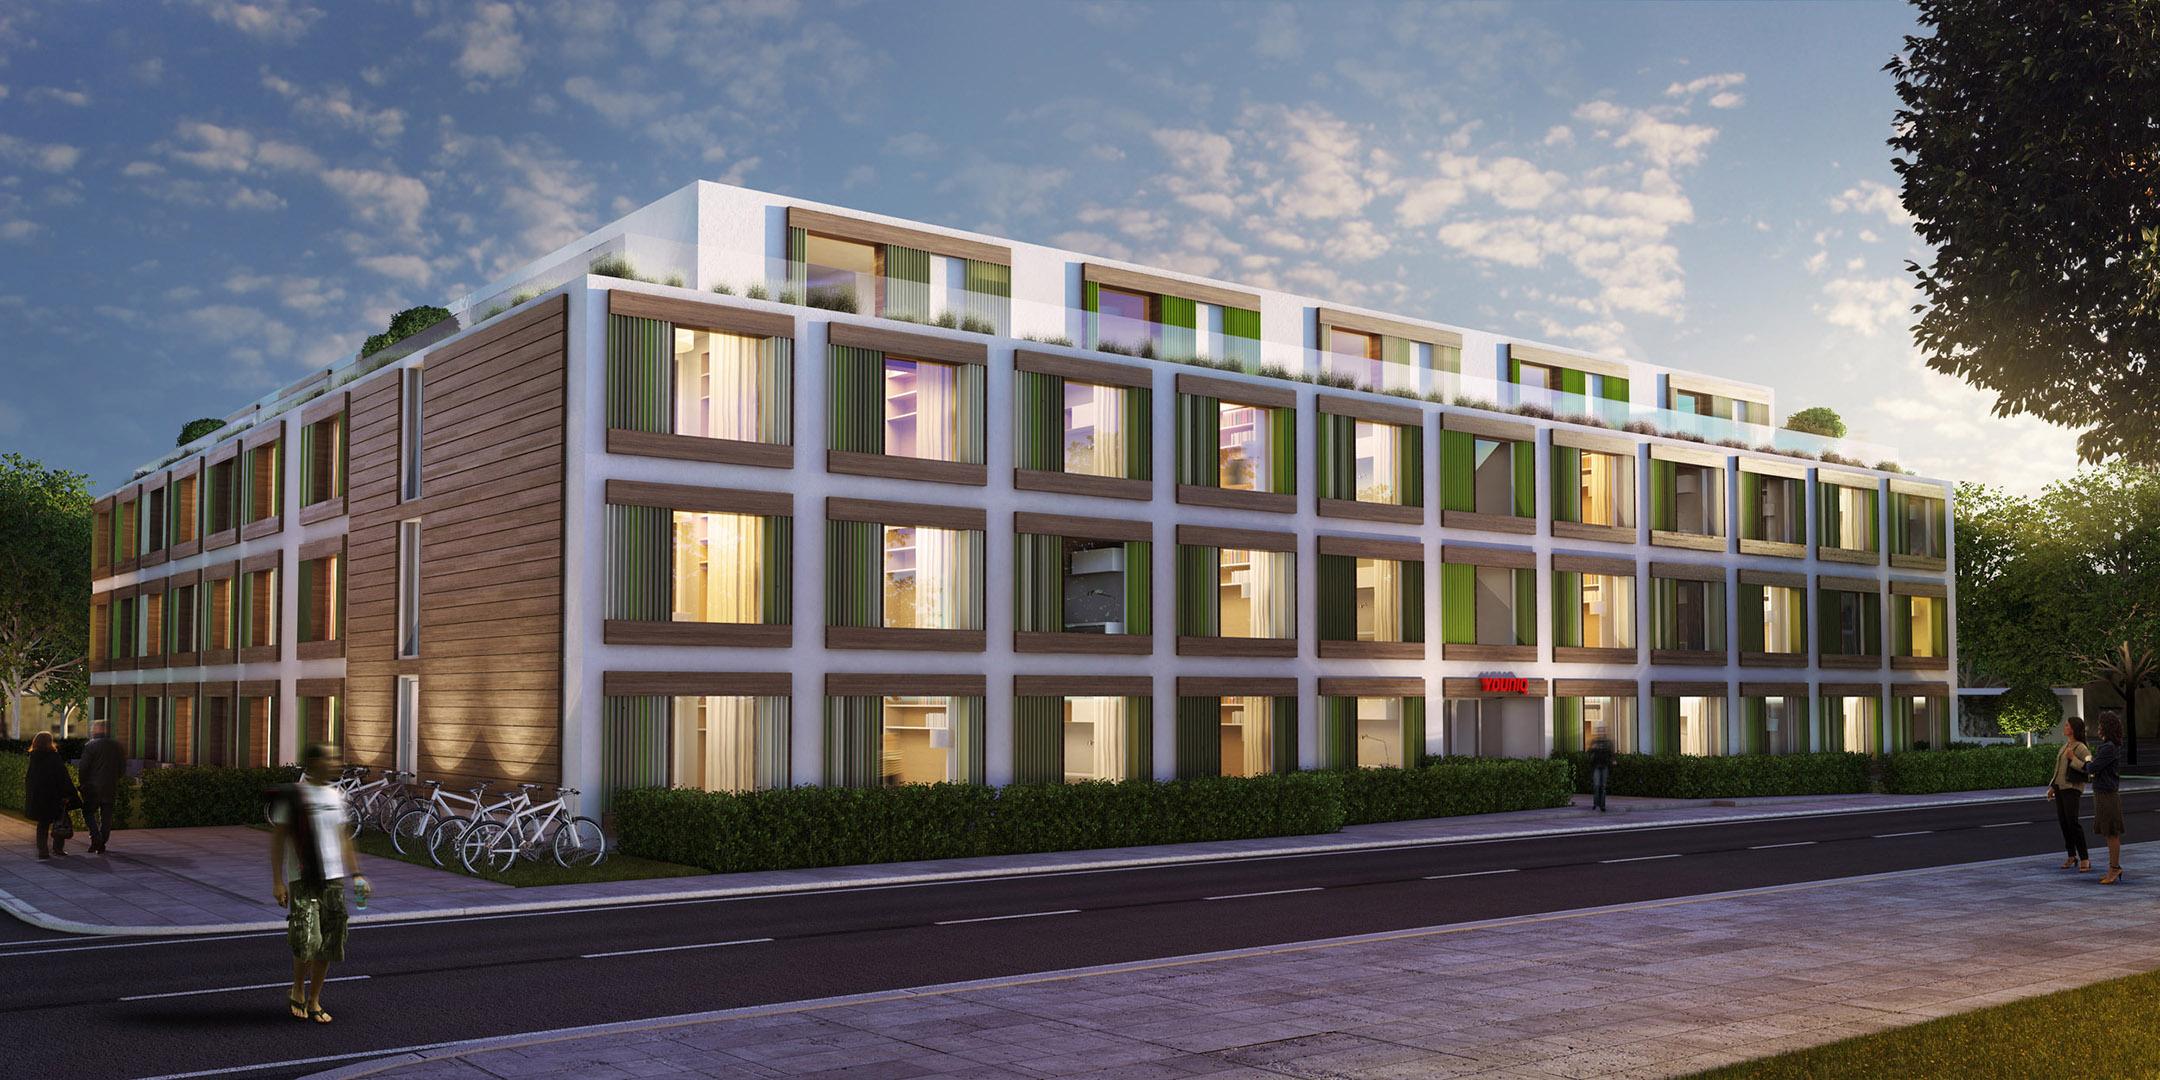 Exterior student housing